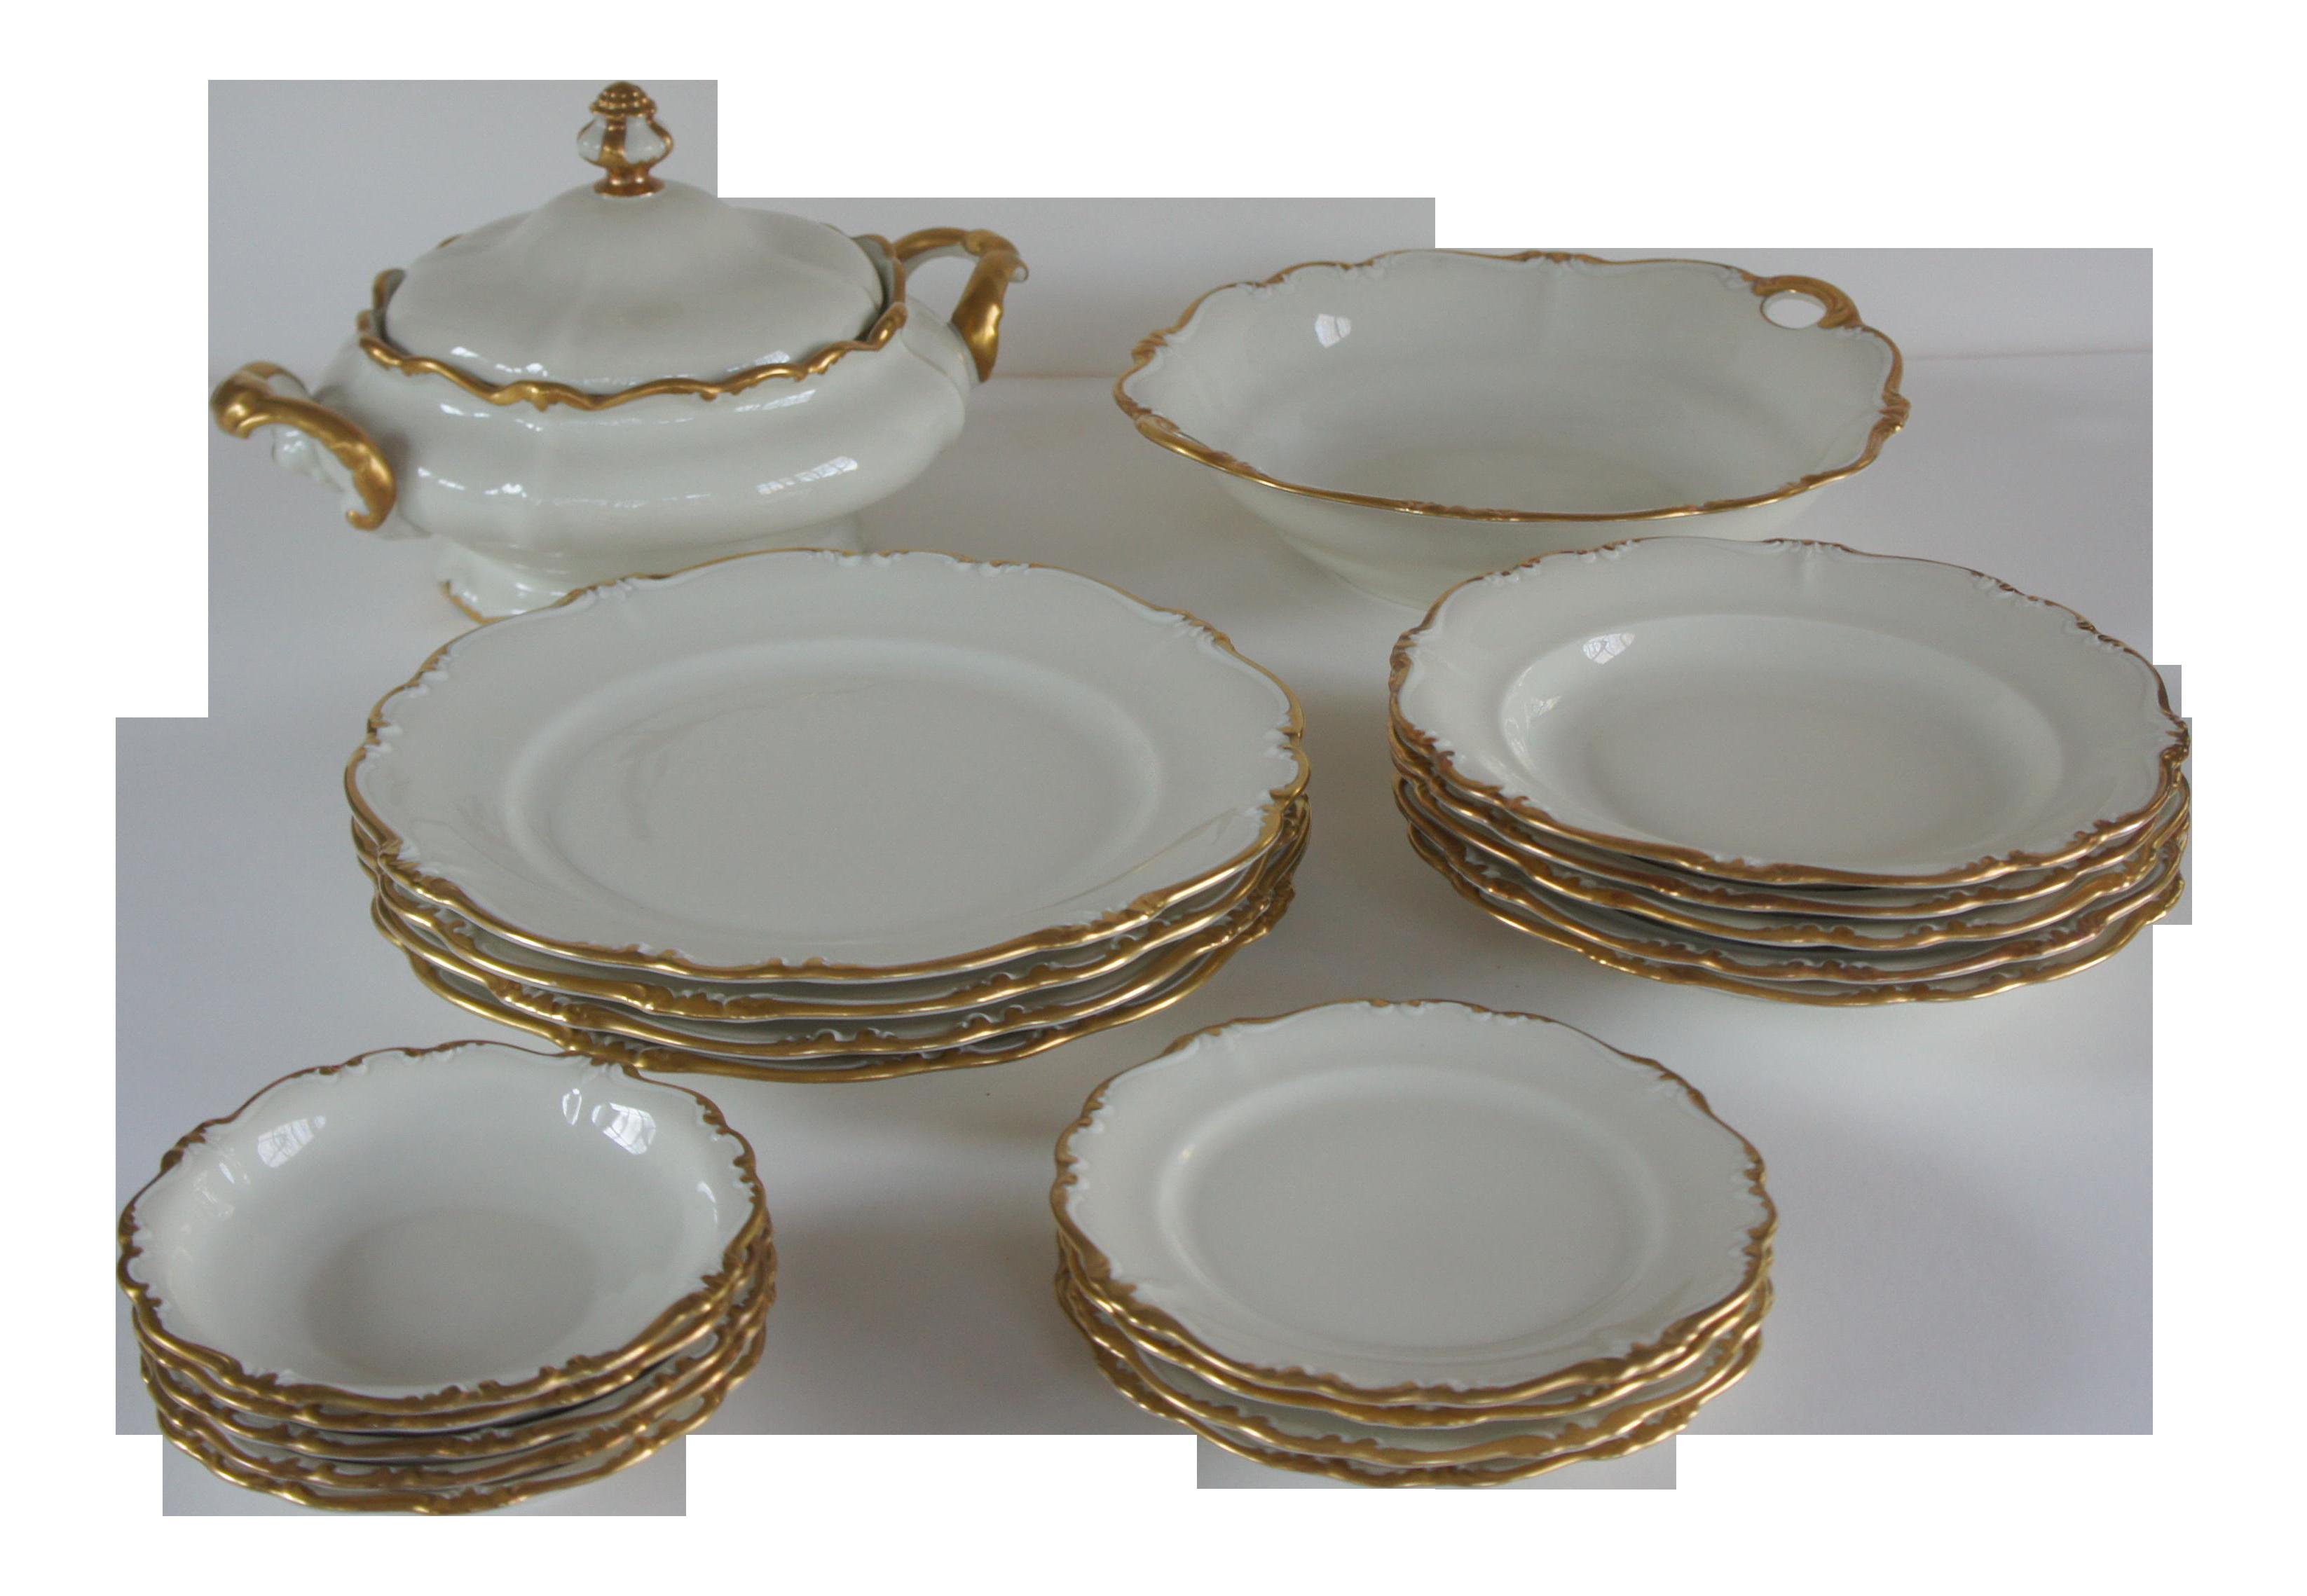 Rosenthal Pompadour Baroque Gold Dinnerware Set - Service for 4 Plus Extras  sc 1 st  Chairish & Rosenthal Pompadour Baroque Gold Dinnerware Set - Service for 4 Plus ...